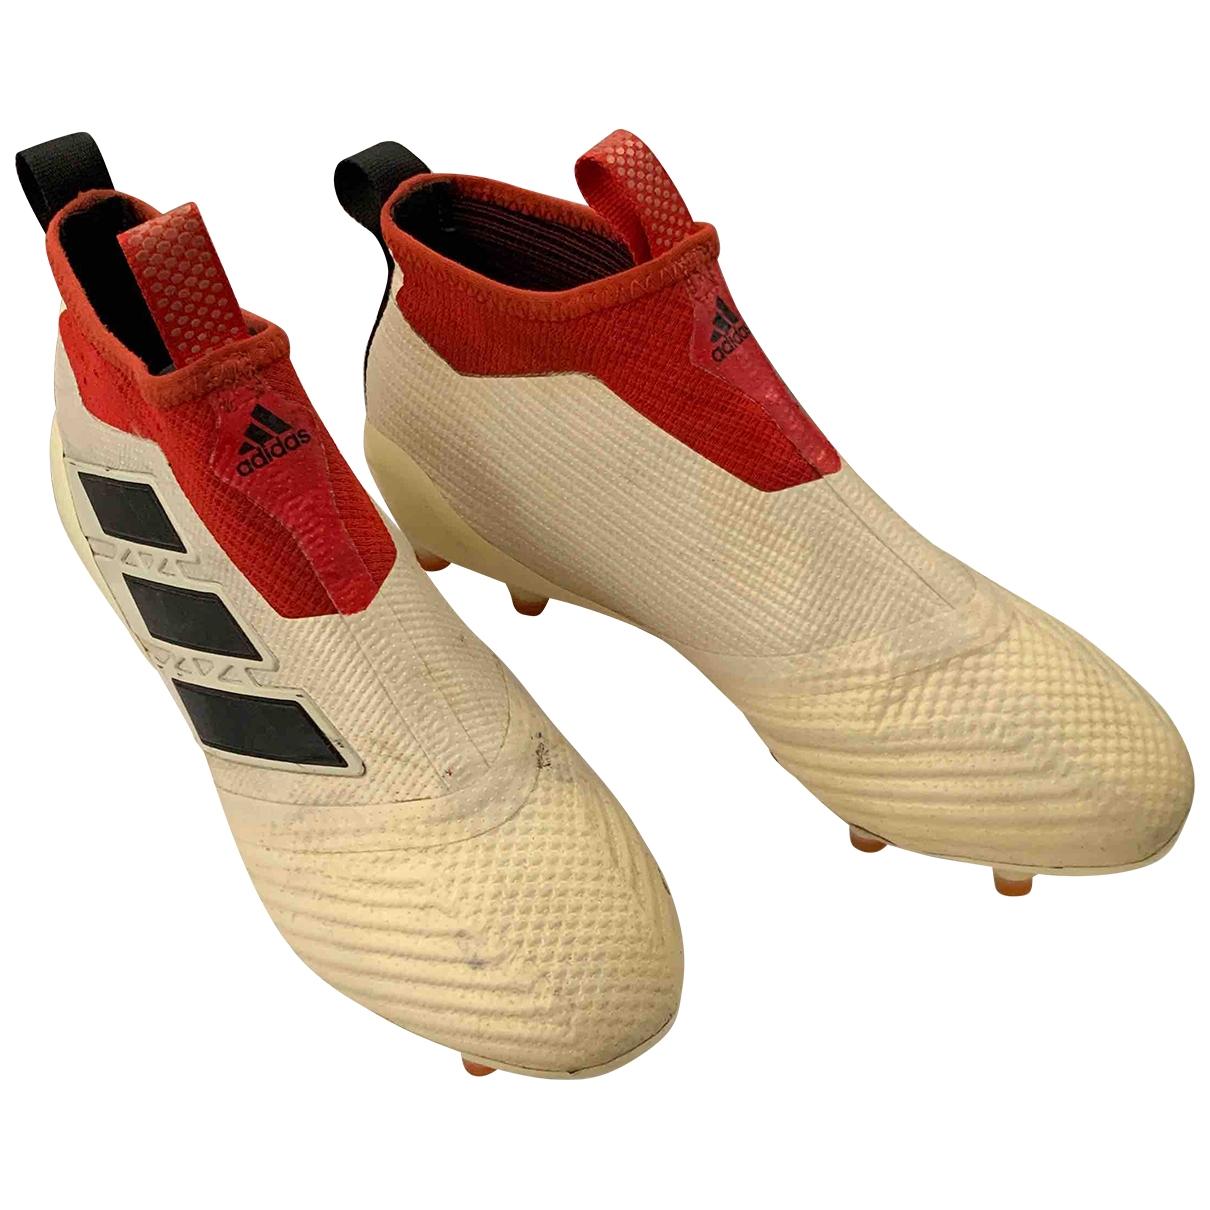 Adidas \N Schnuerschuhe in  Weiss Polyester